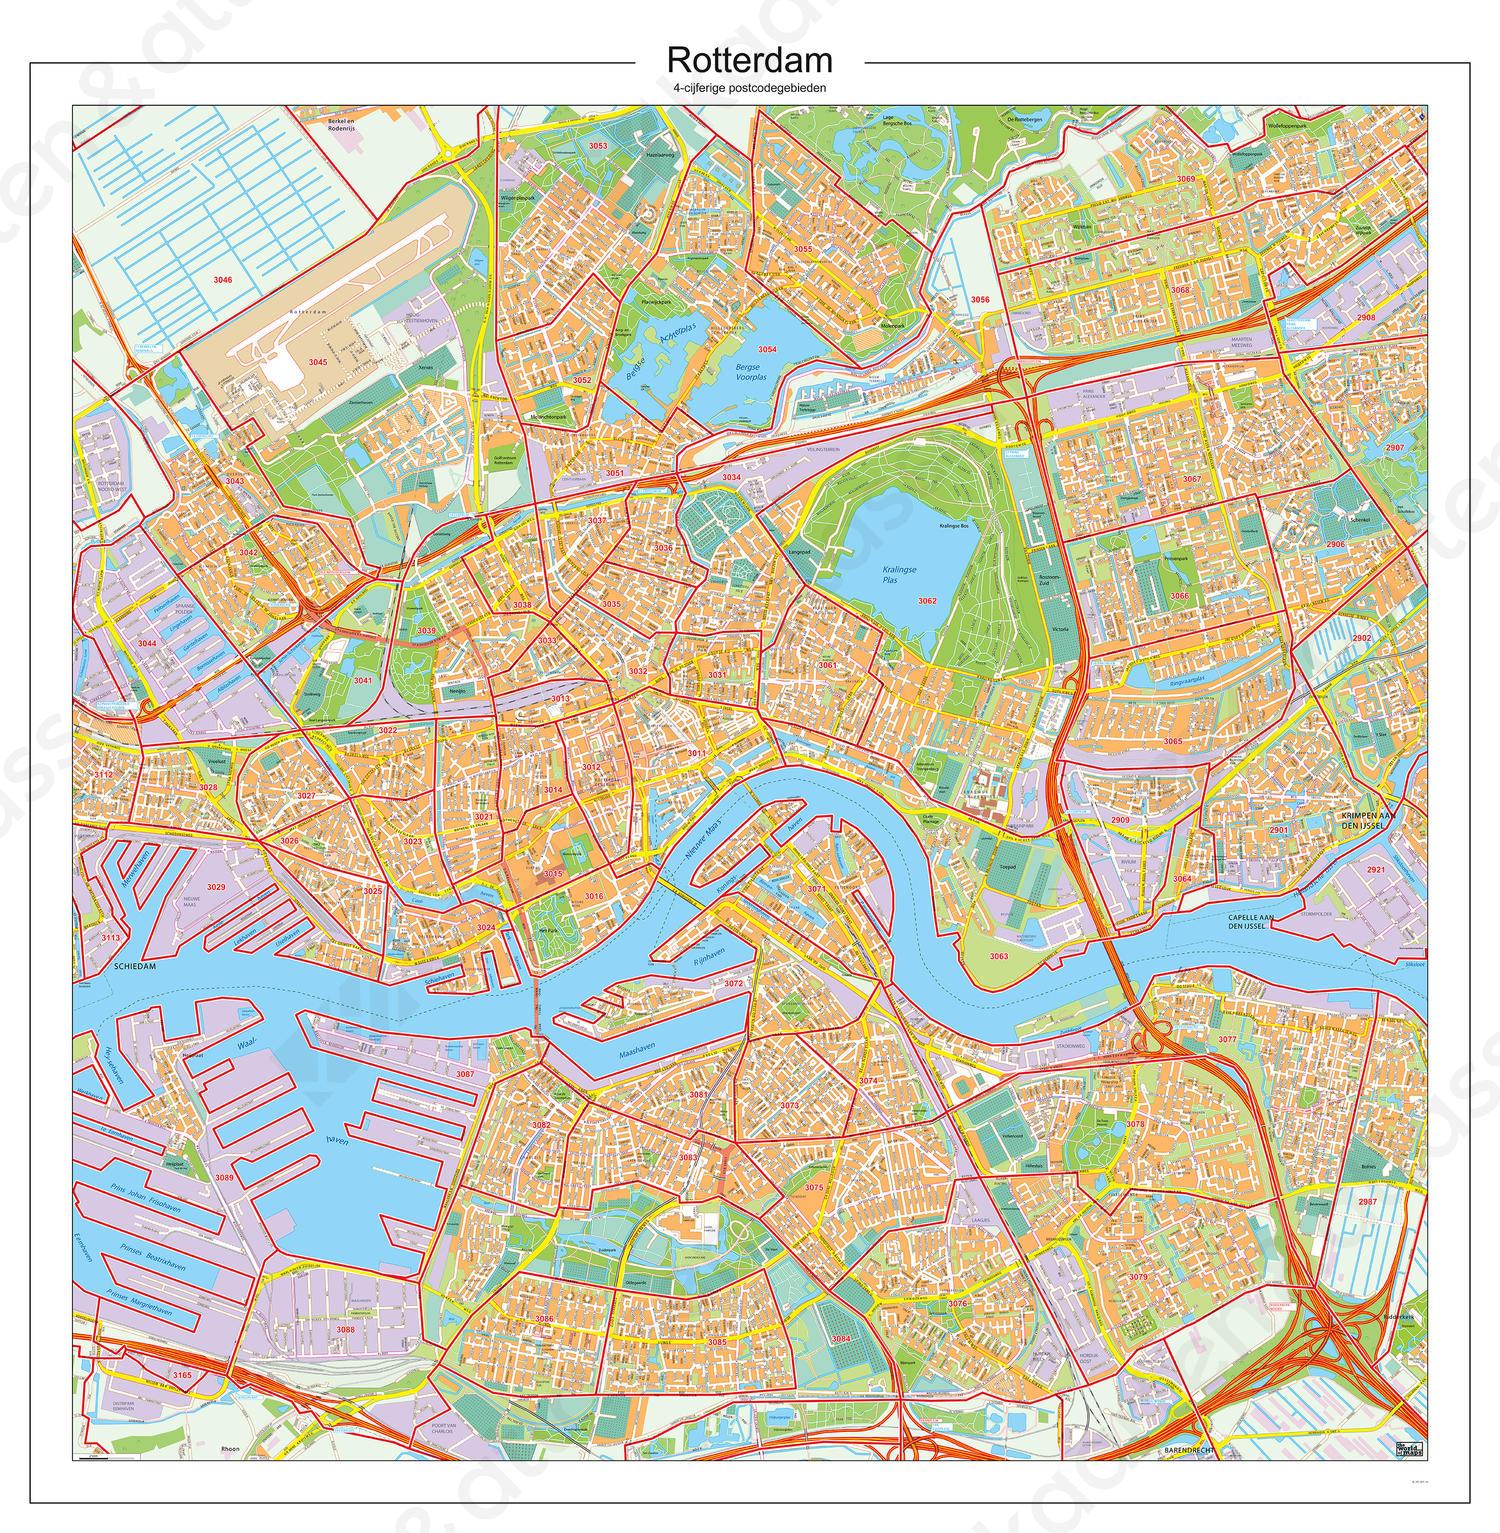 Digitale Postcodekaart Rotterdam